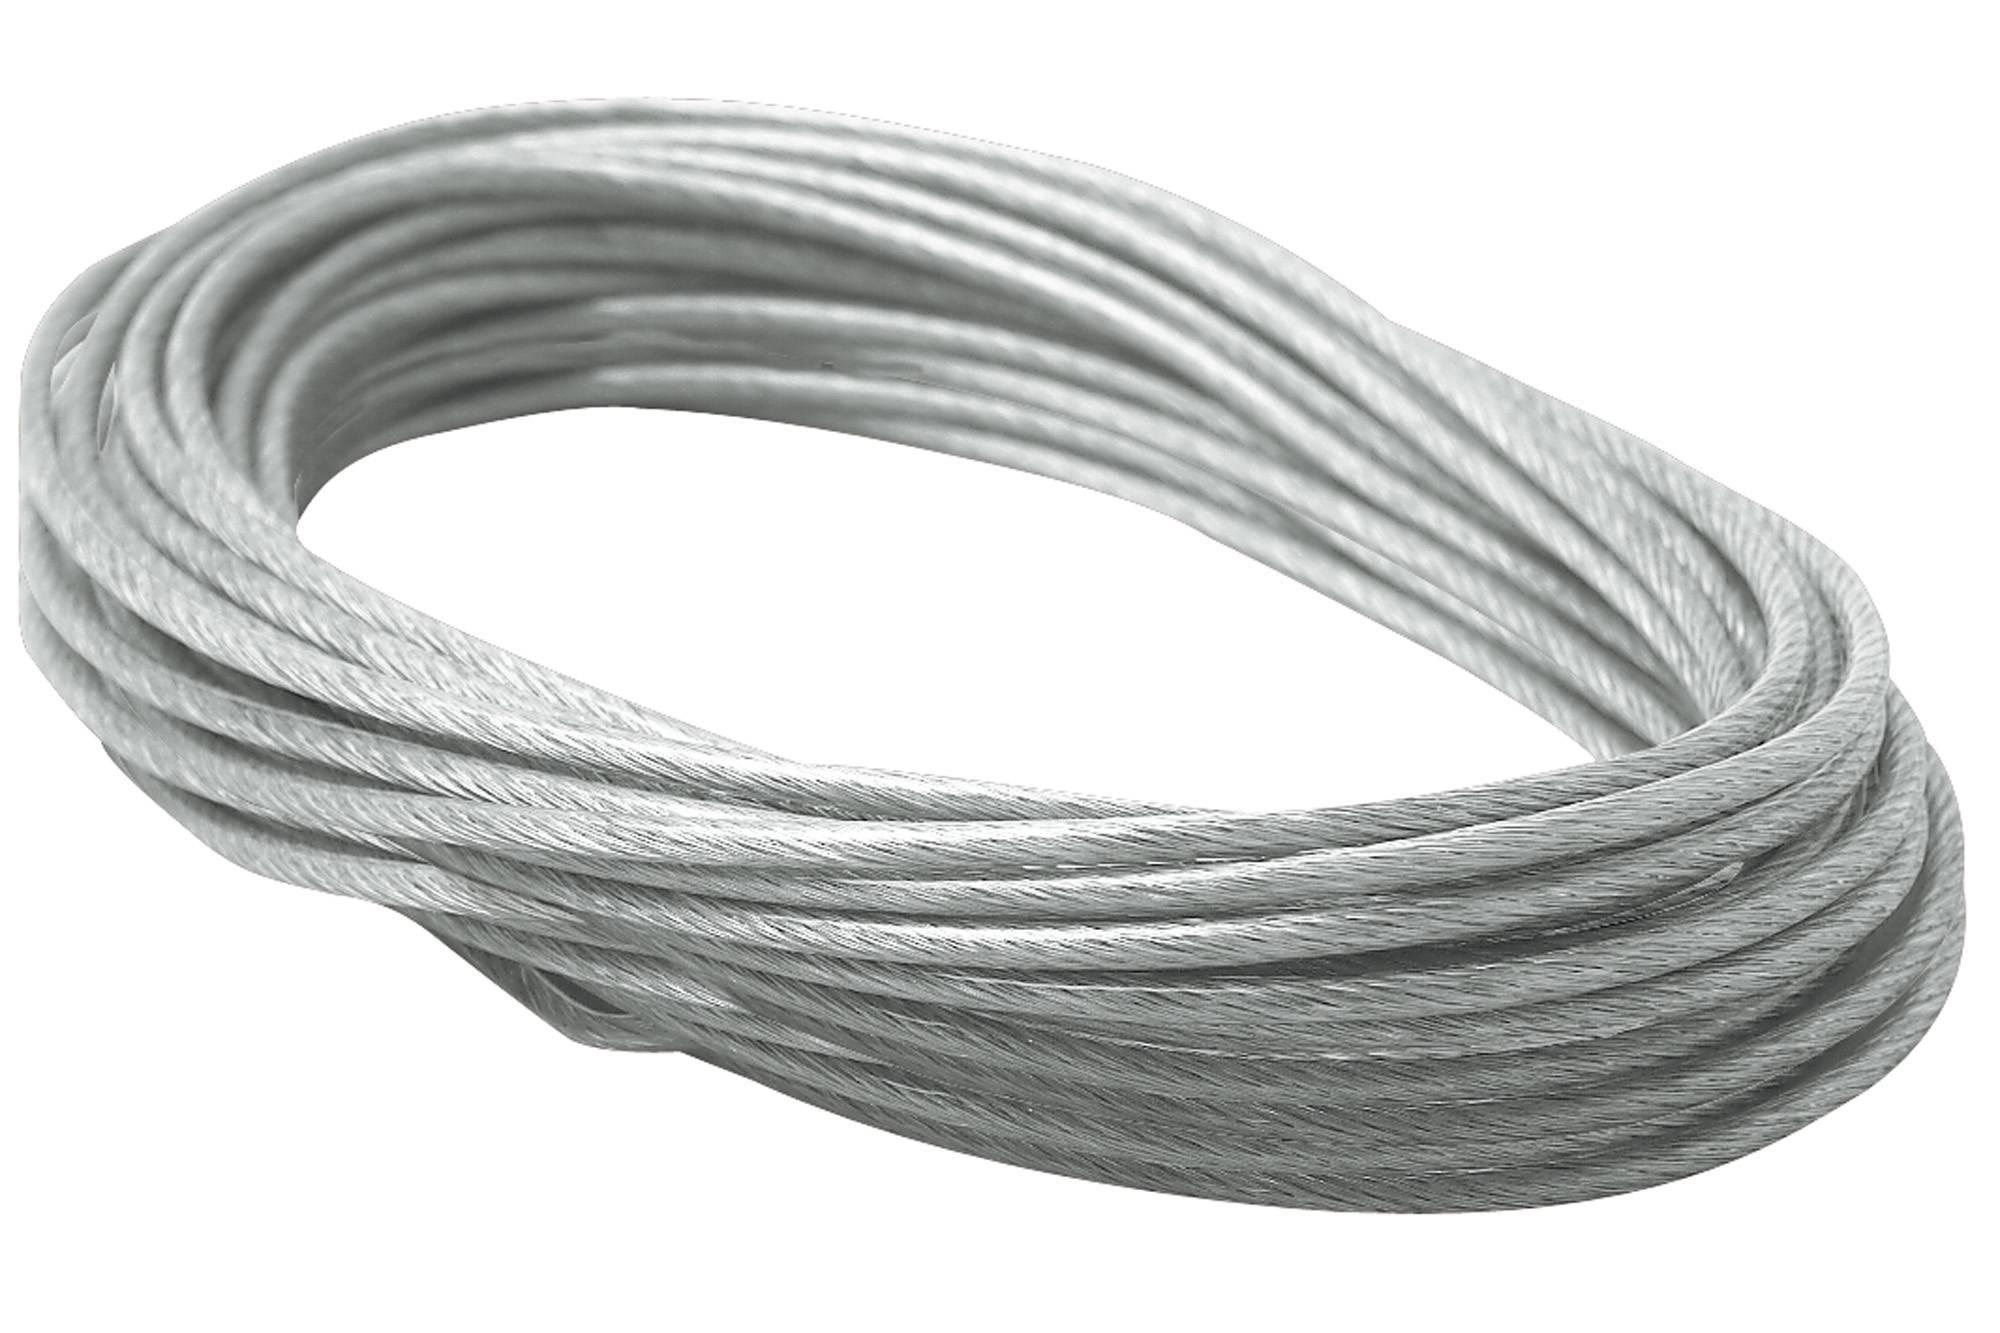 Izolované lanko Paulmann, 979055, 4 mm², 12 m, transparentní/šedá